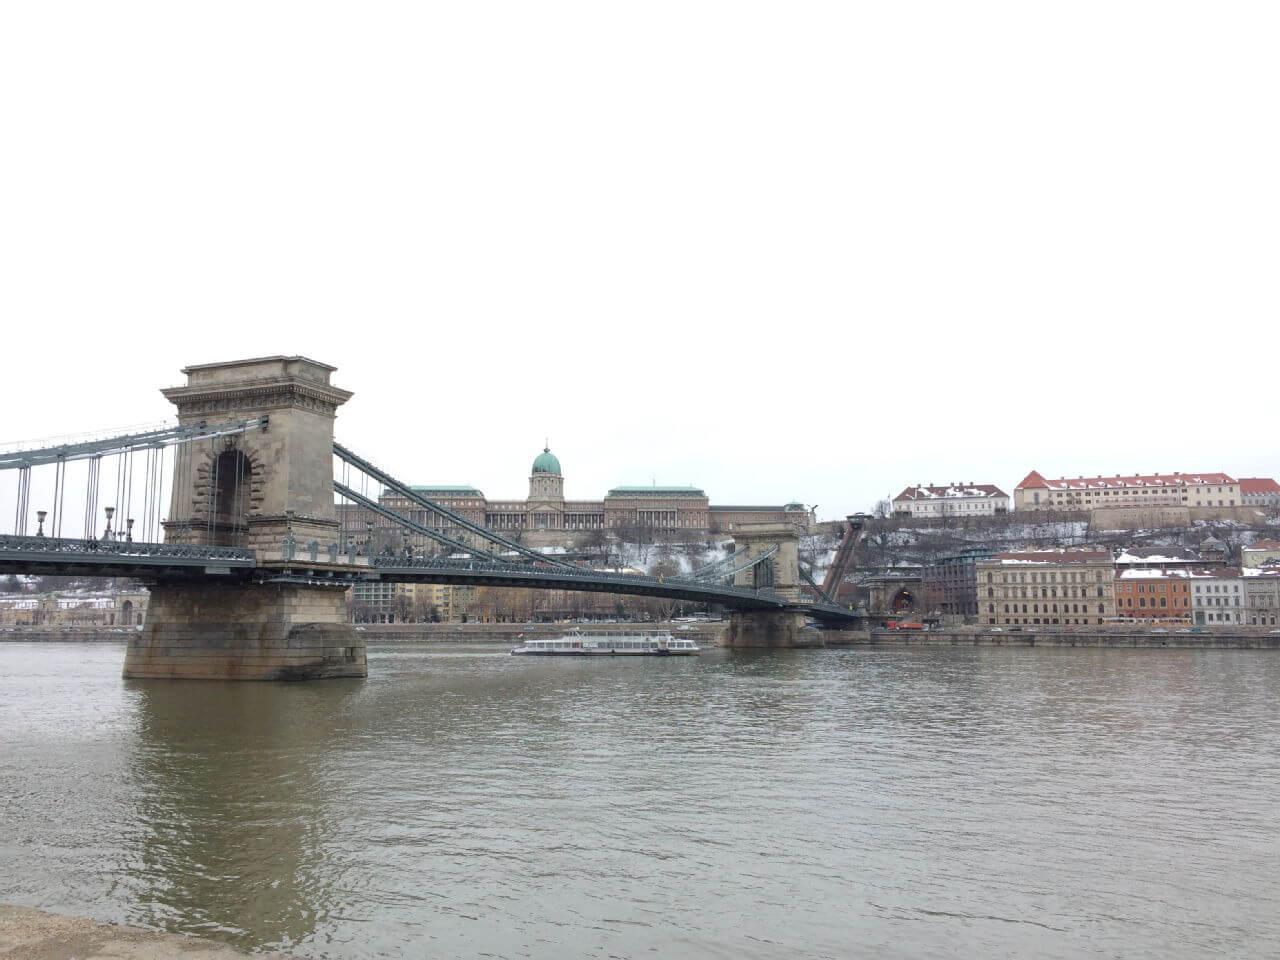 Palace and bridge